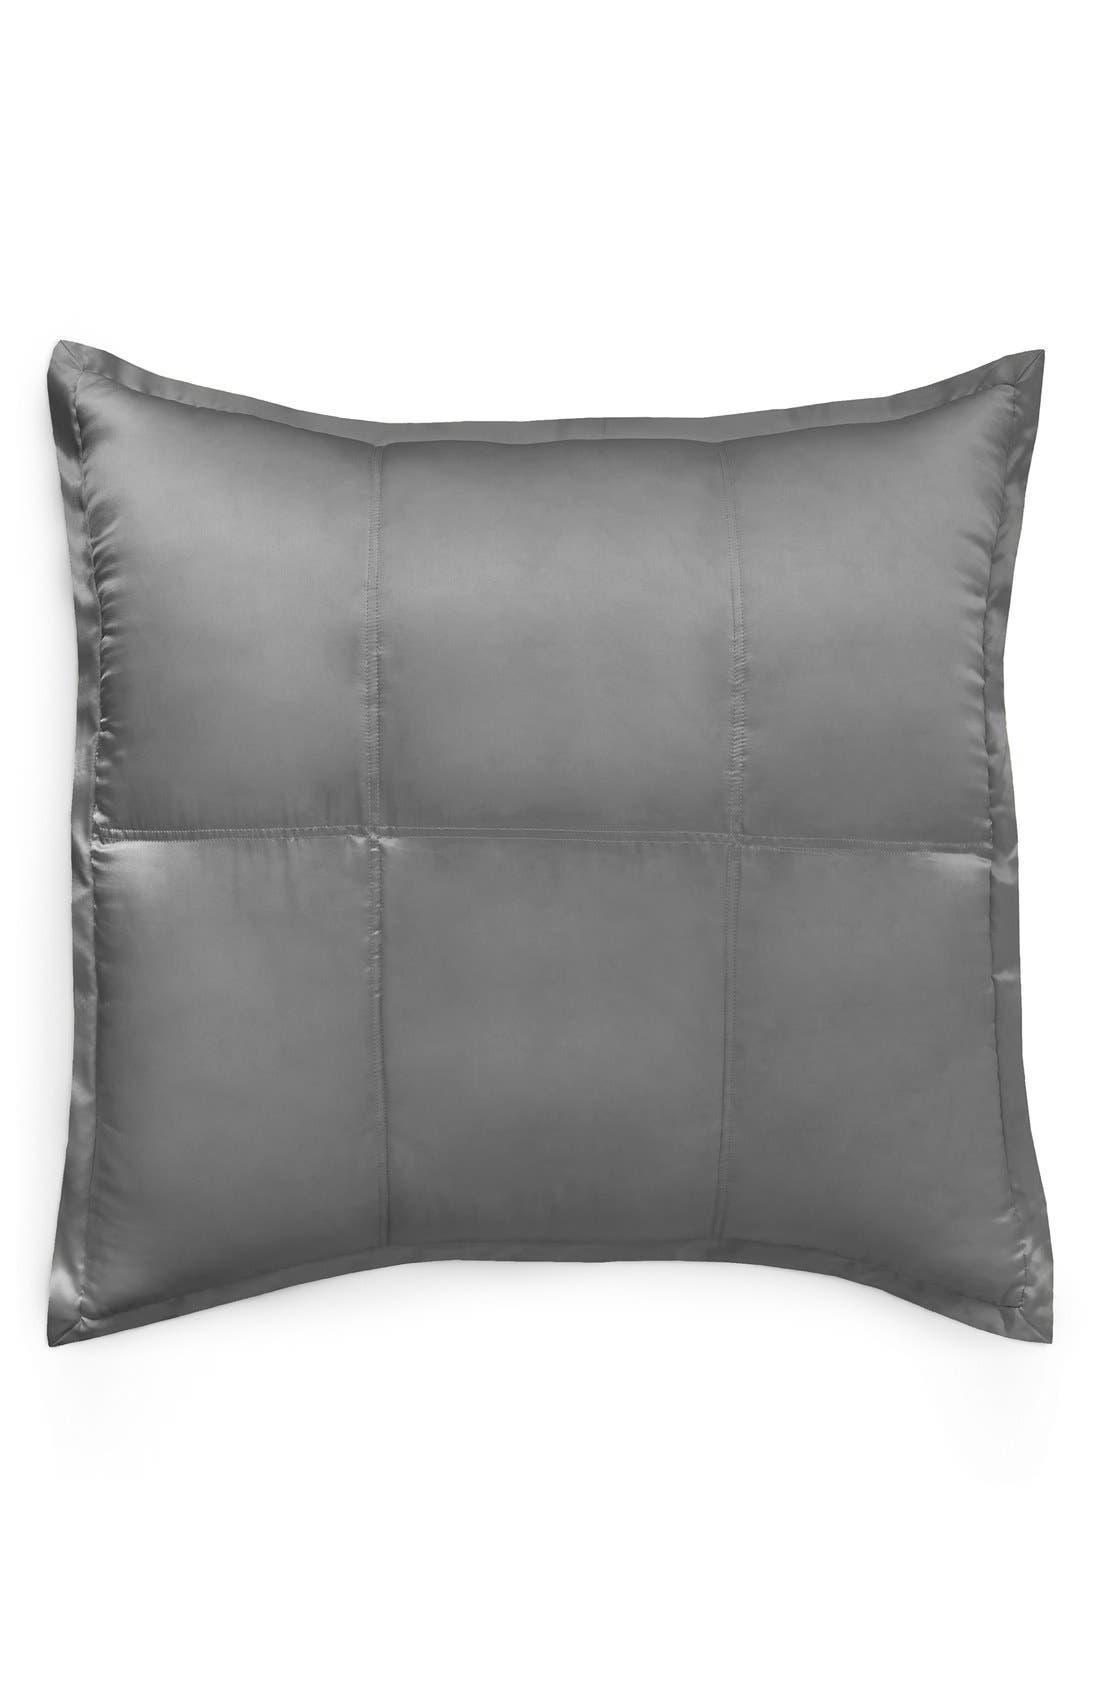 Alternate Image 1 Selected - Donna Karan Collection 'Surface' Silk Charmeuse Euro Pillow Sham